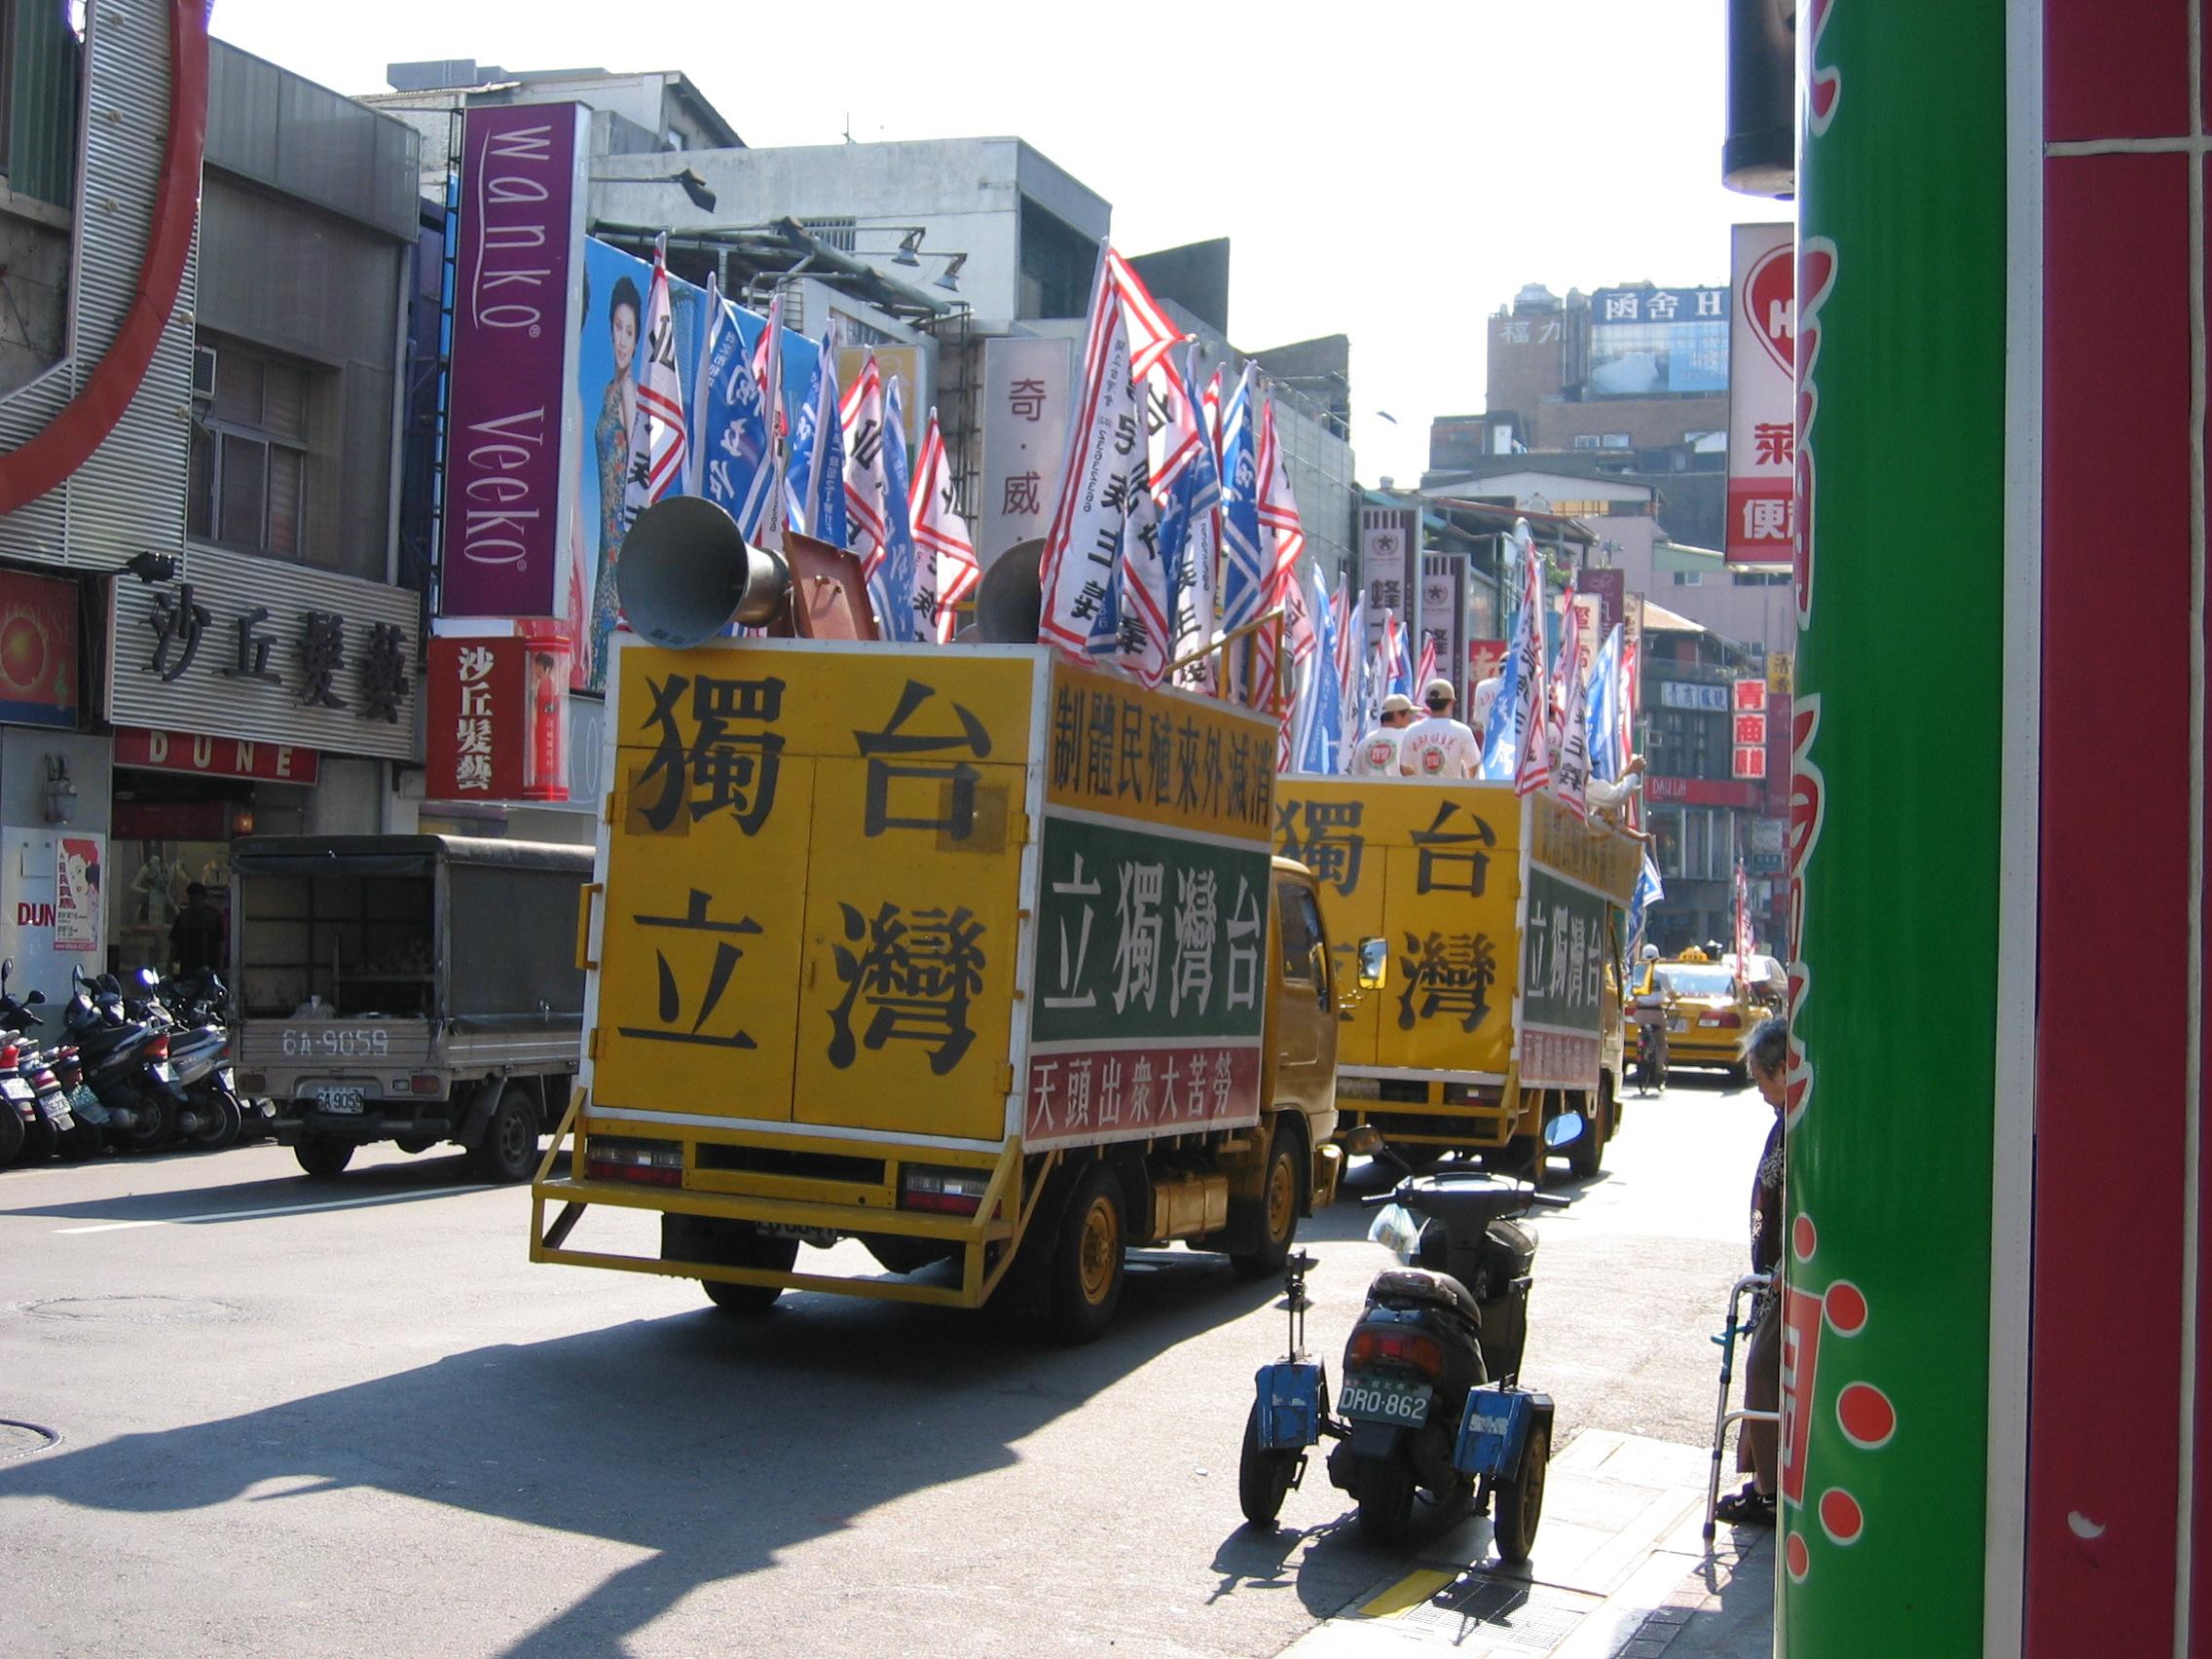 「taiwan independence」的圖片搜尋結果